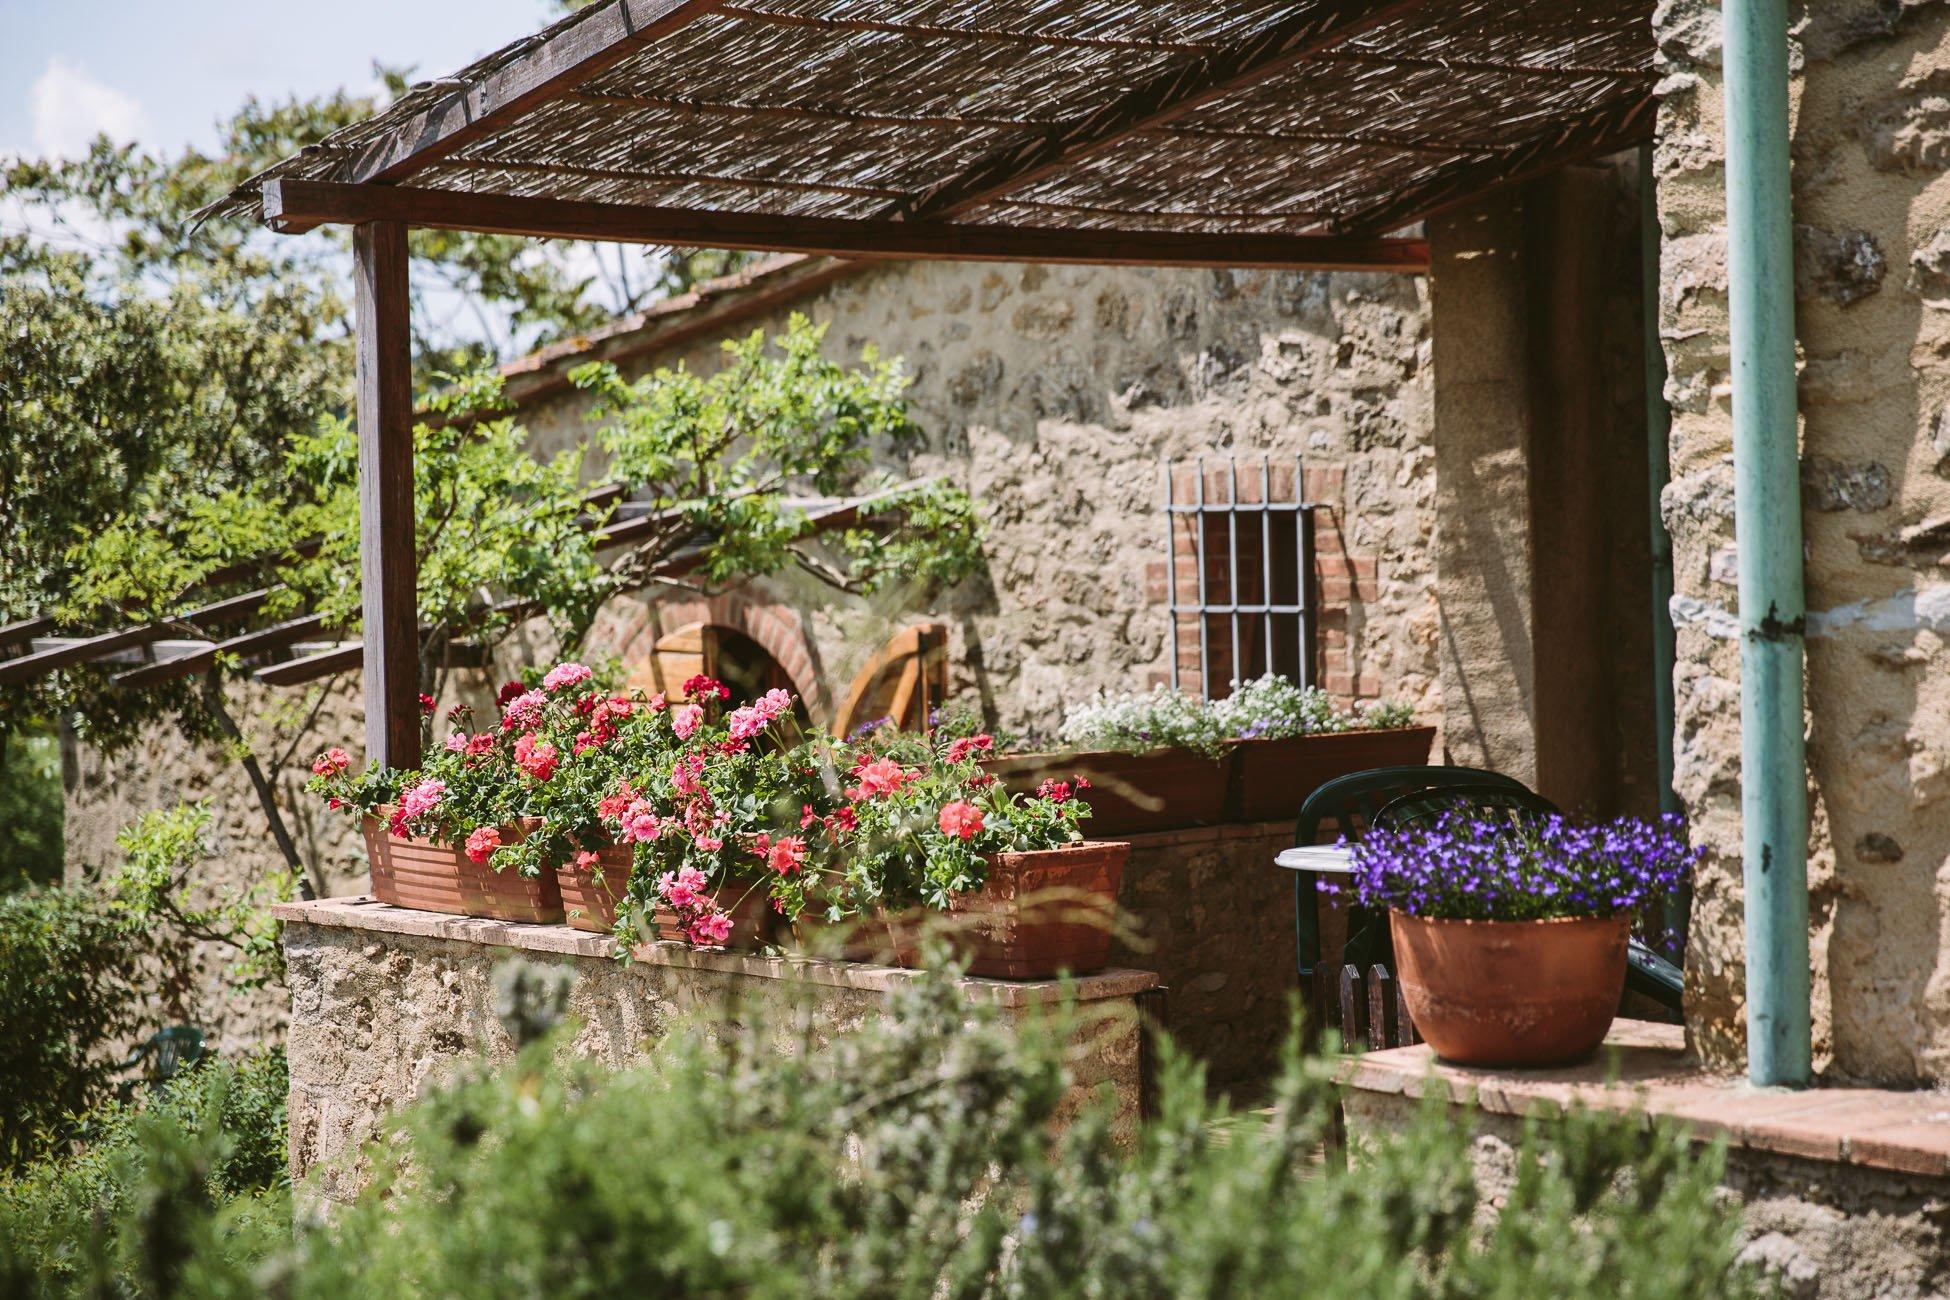 Apparita Agriturismo in Pomarance Tuscany